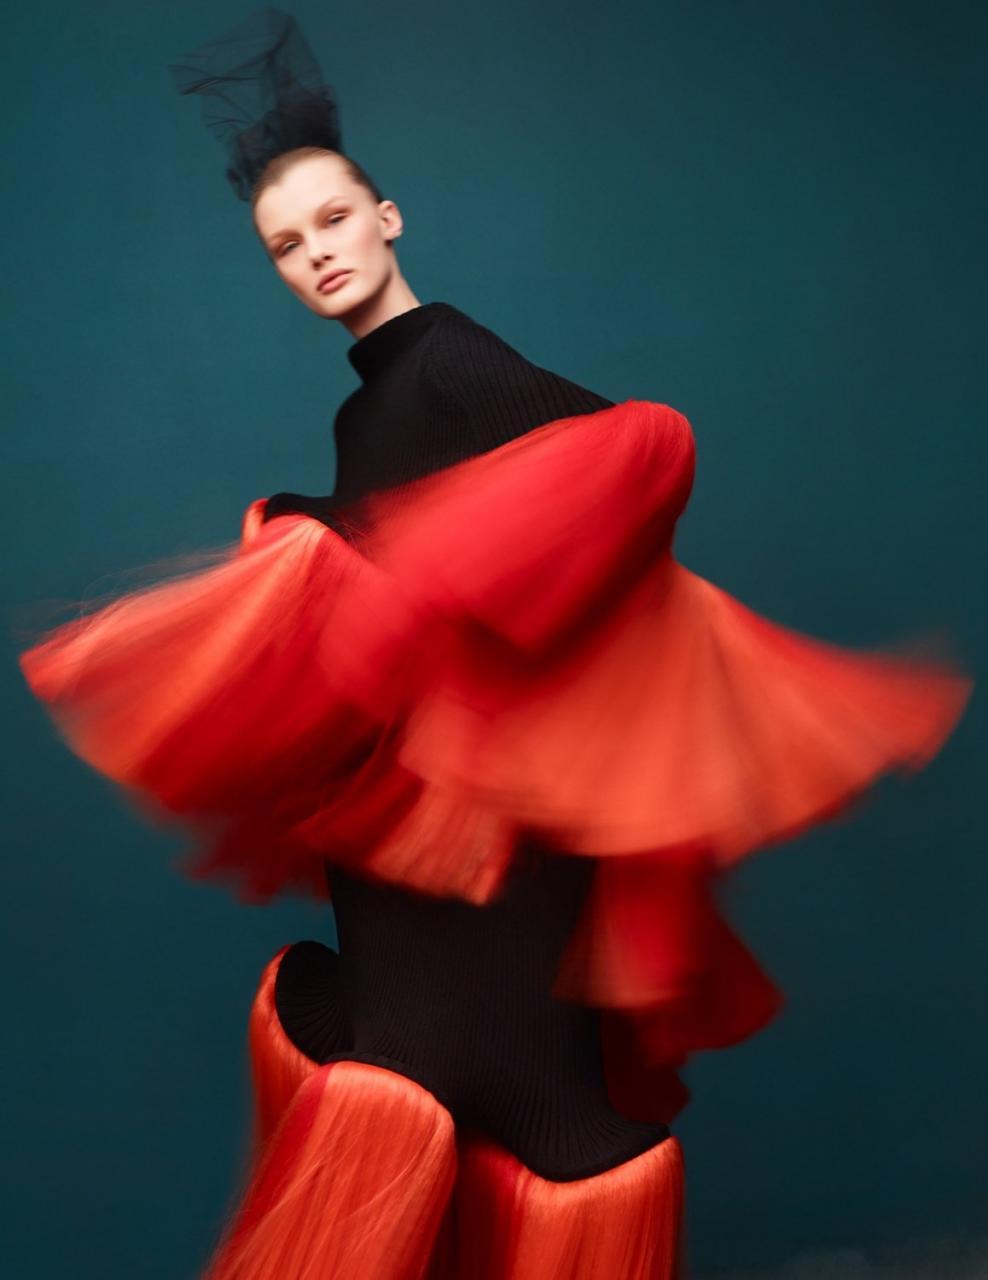 《VOGUE》中国版2019年1月刊 超模Kris Grikaite出镜 时尚图库 第12张